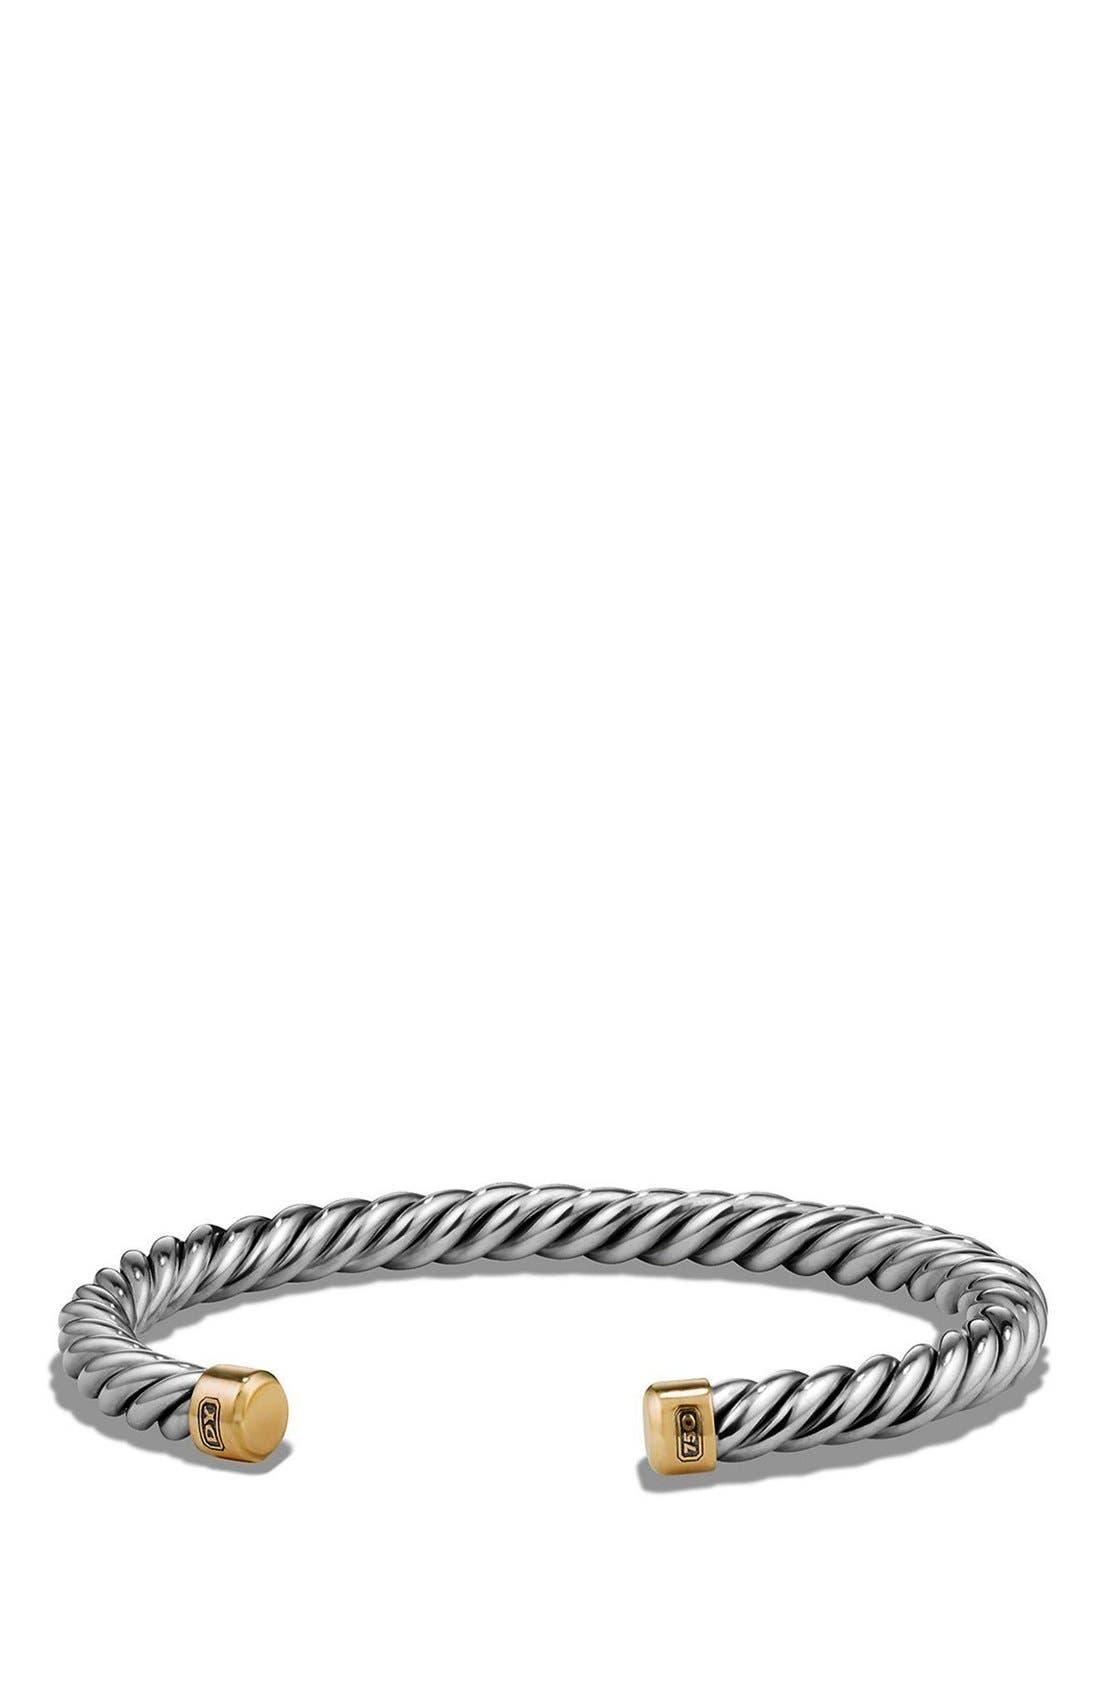 David Yurman 'Cable Classics' Cuff Bracelet with 18K Gold